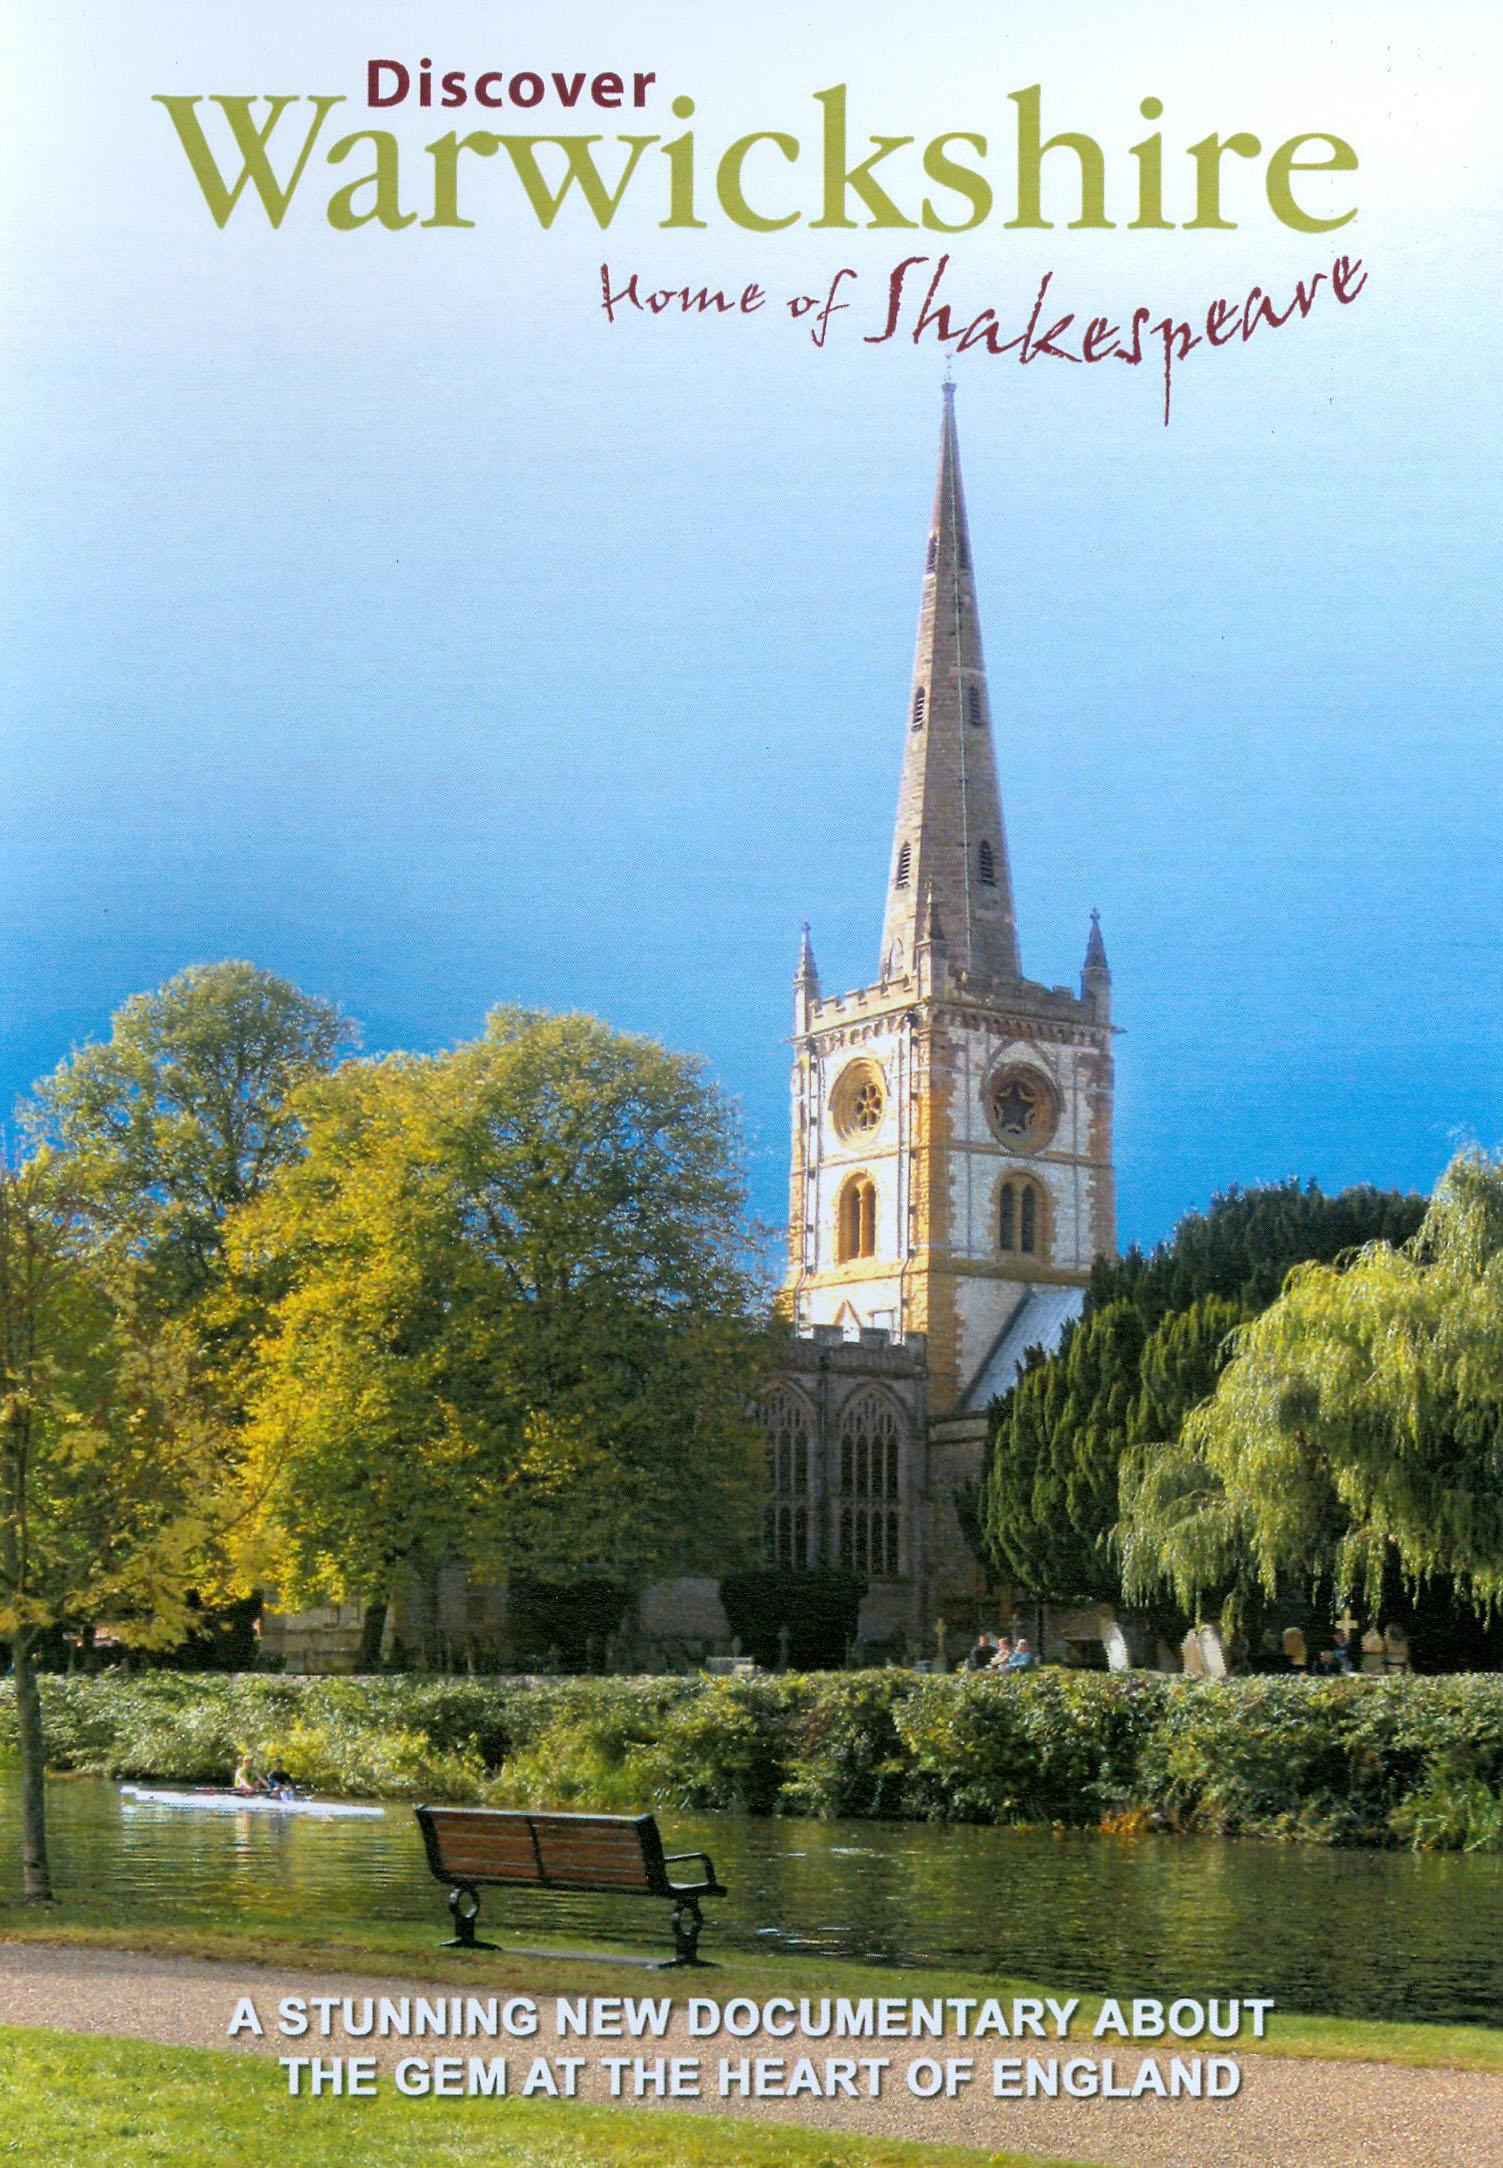 Discover Warwickshire